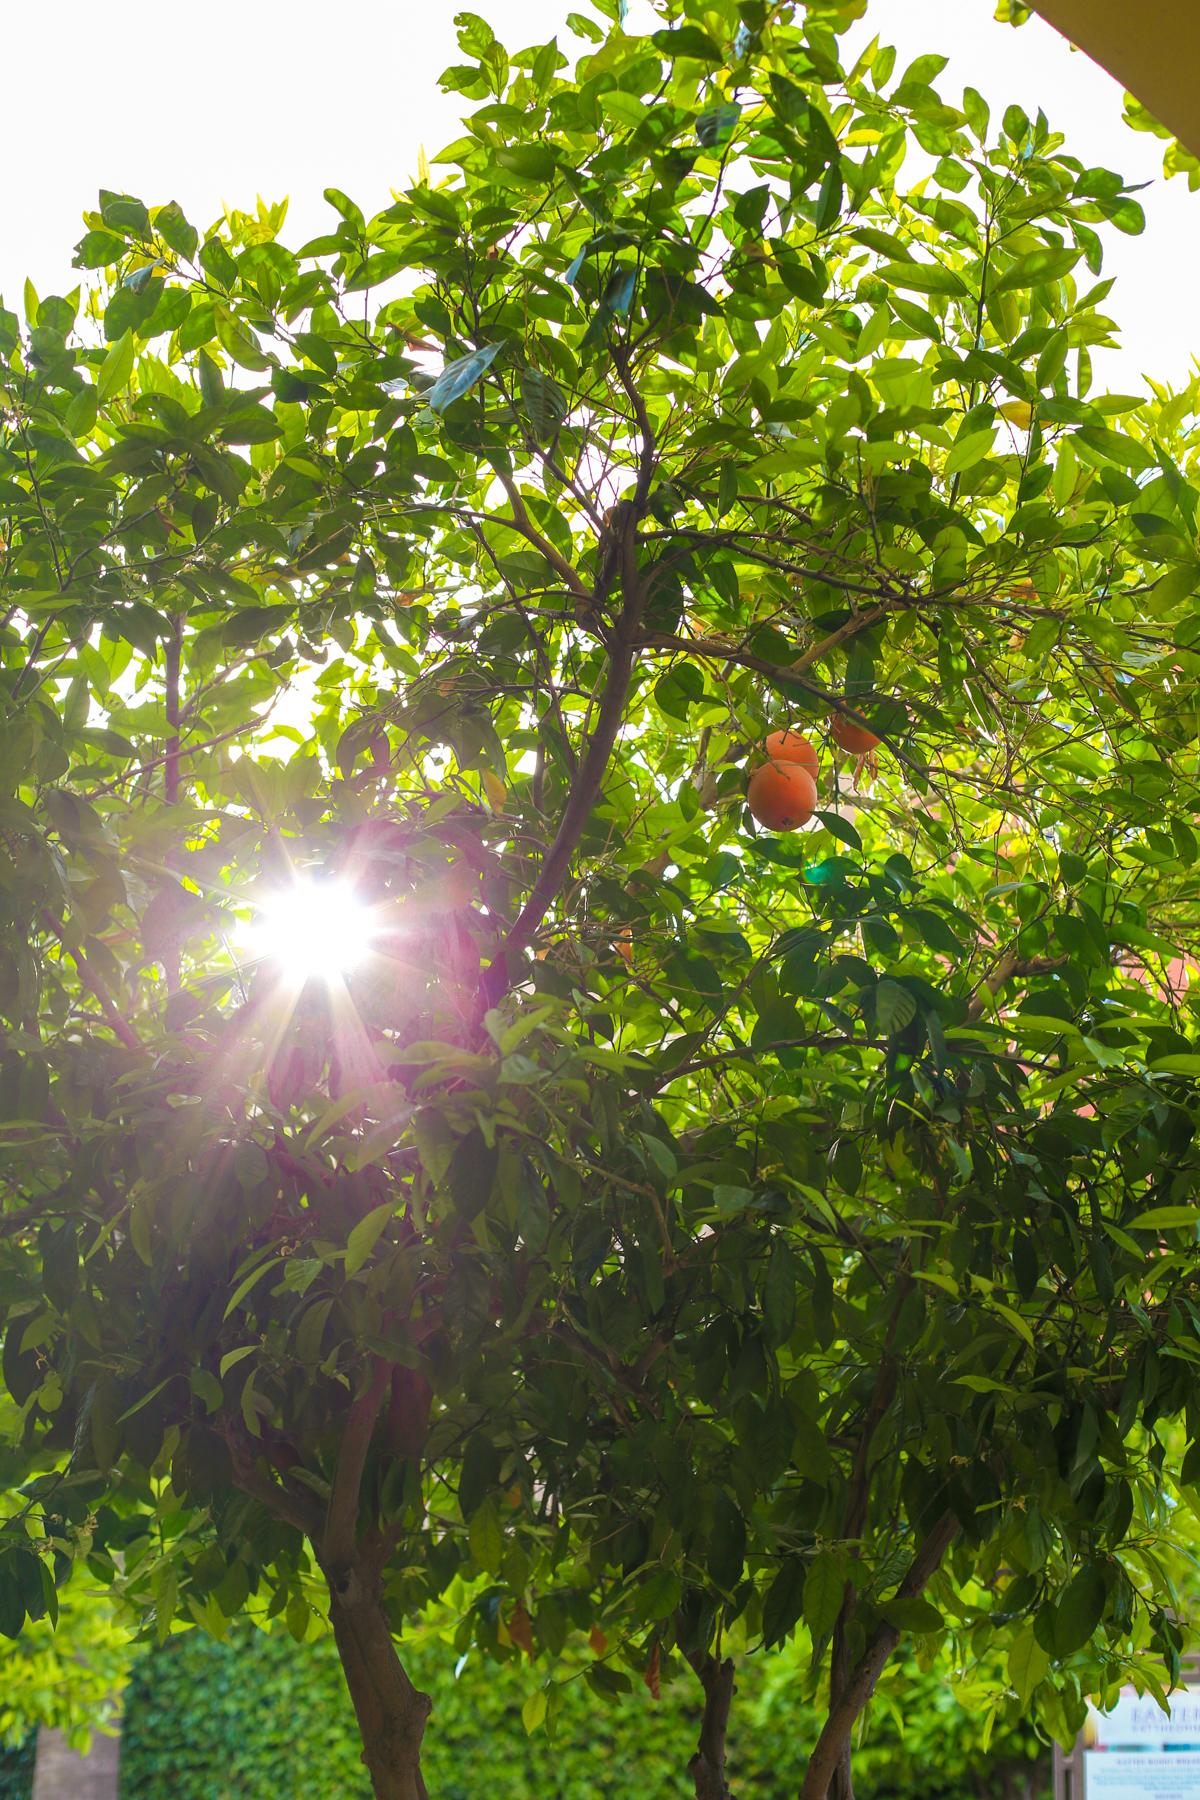 Sunlight peeking through an orange tree